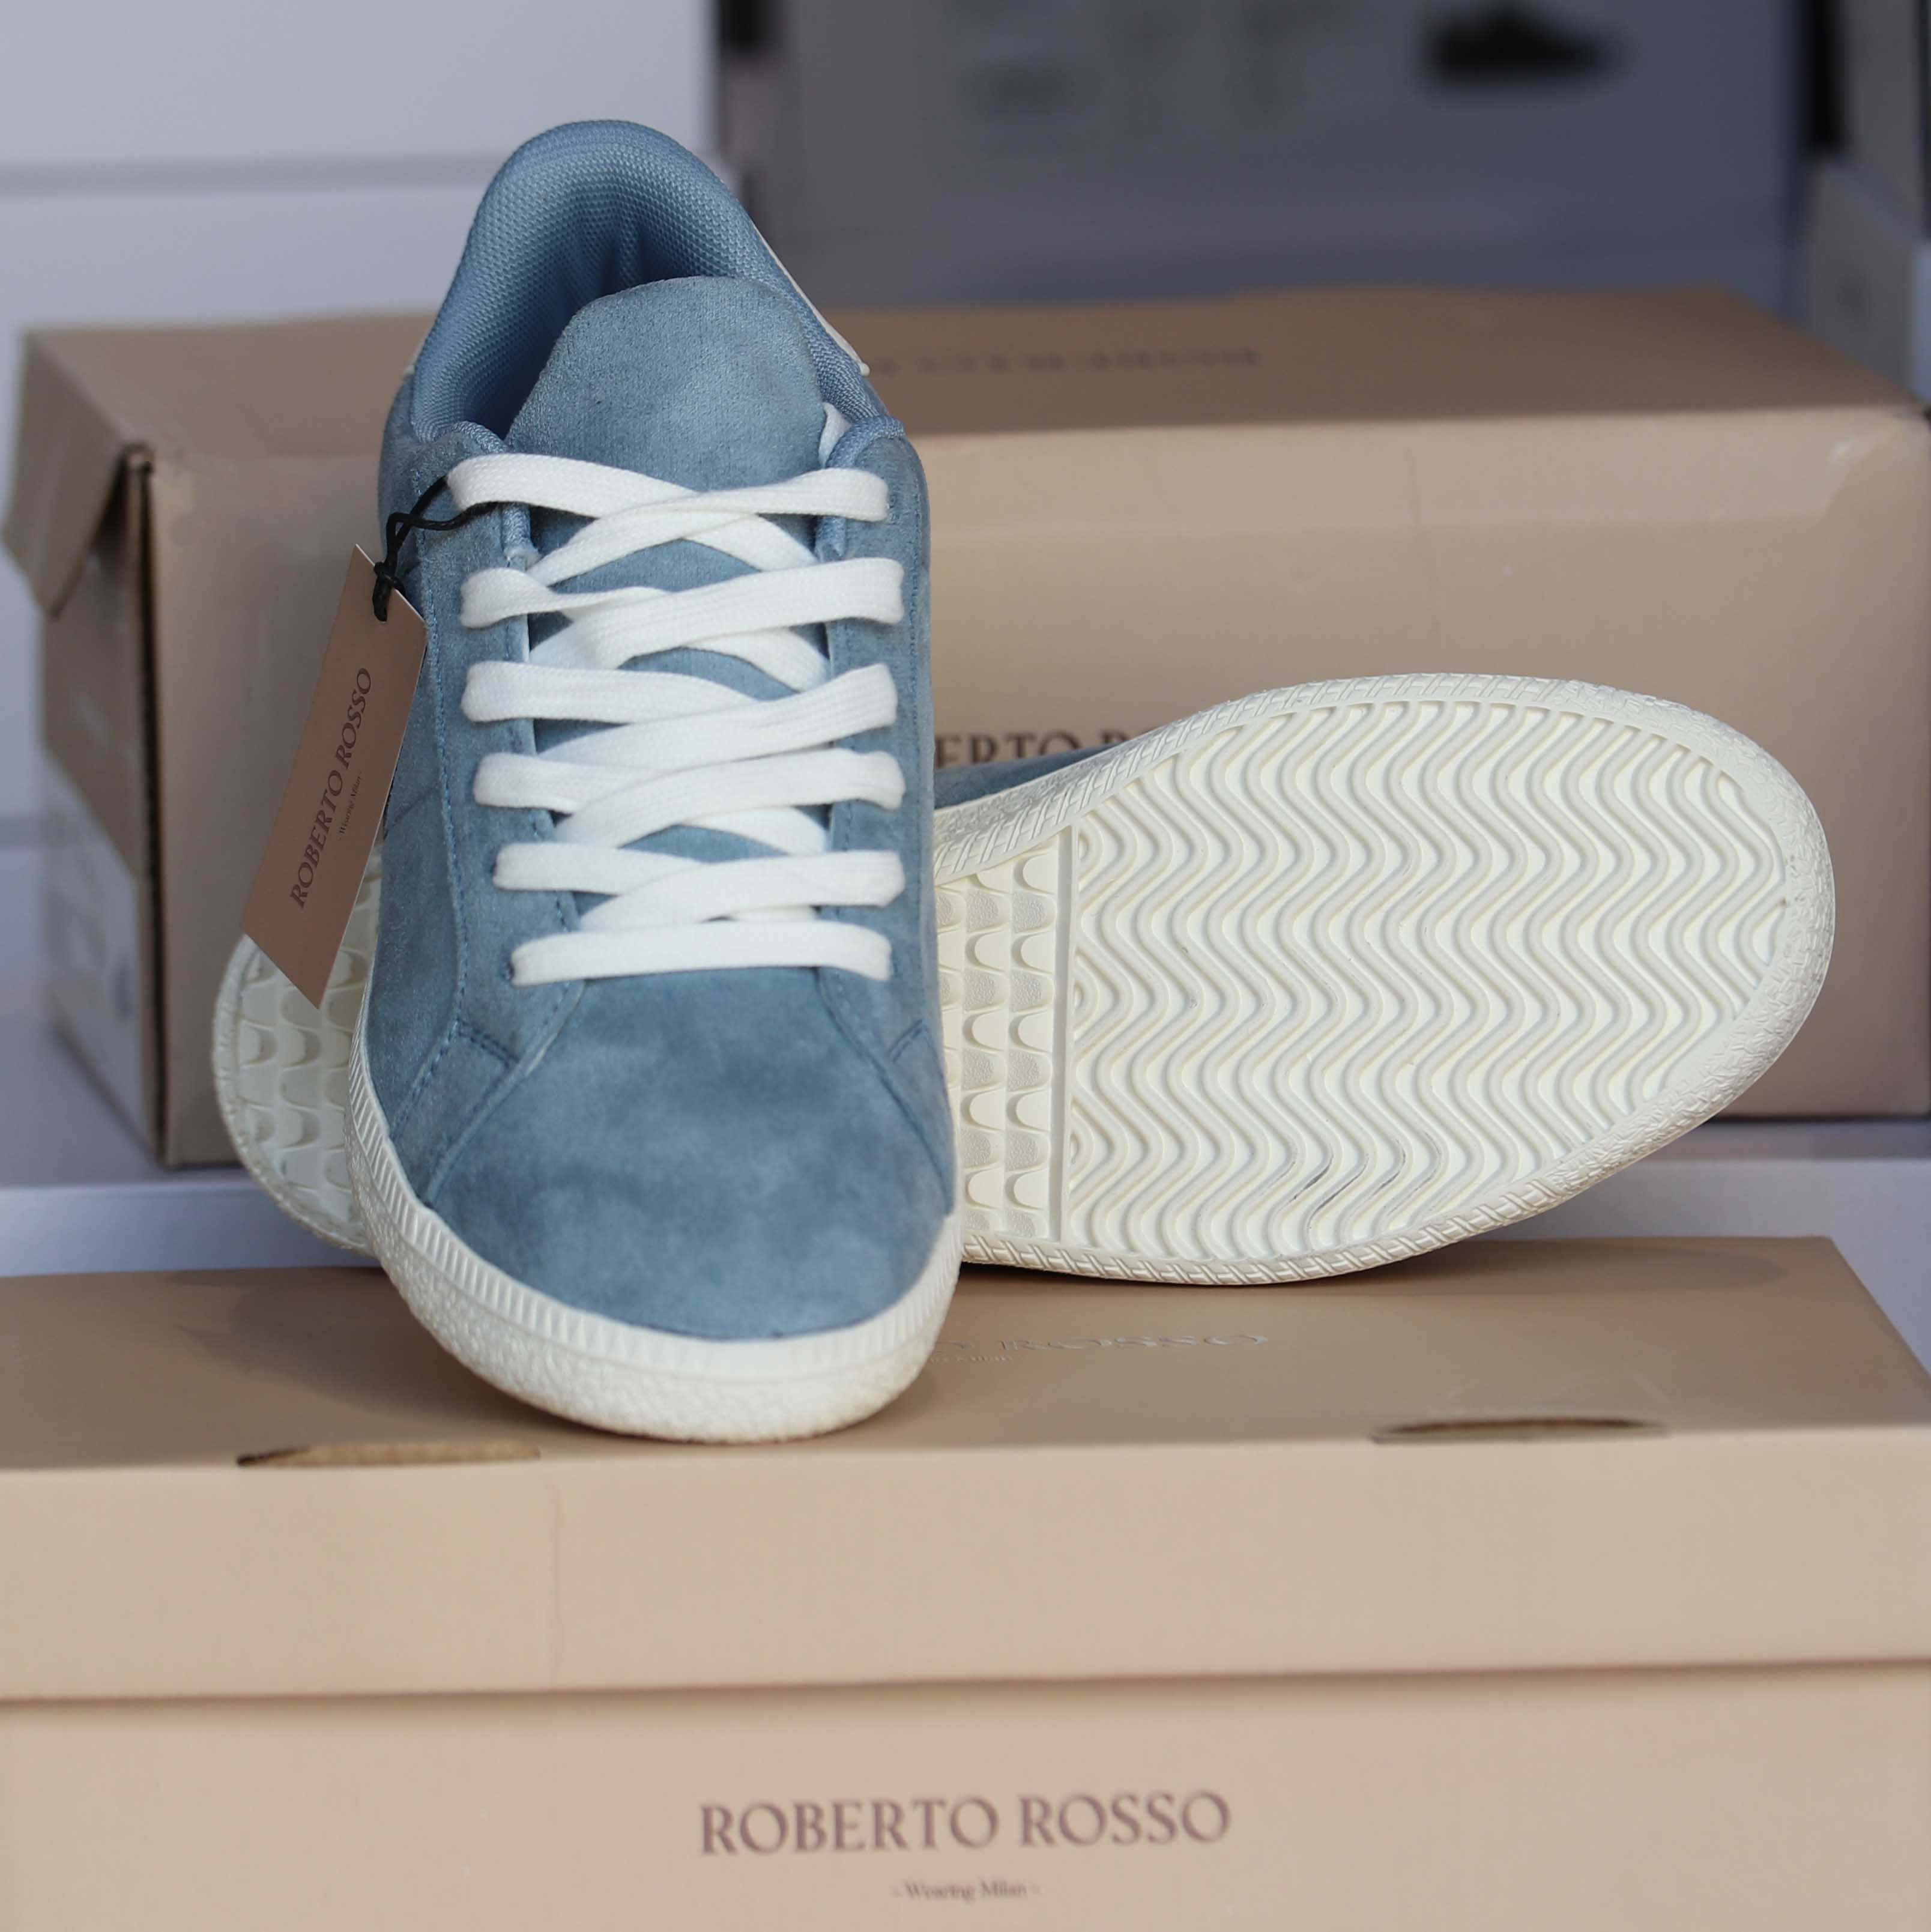 roberto rosso portiva blue sko sommer 7